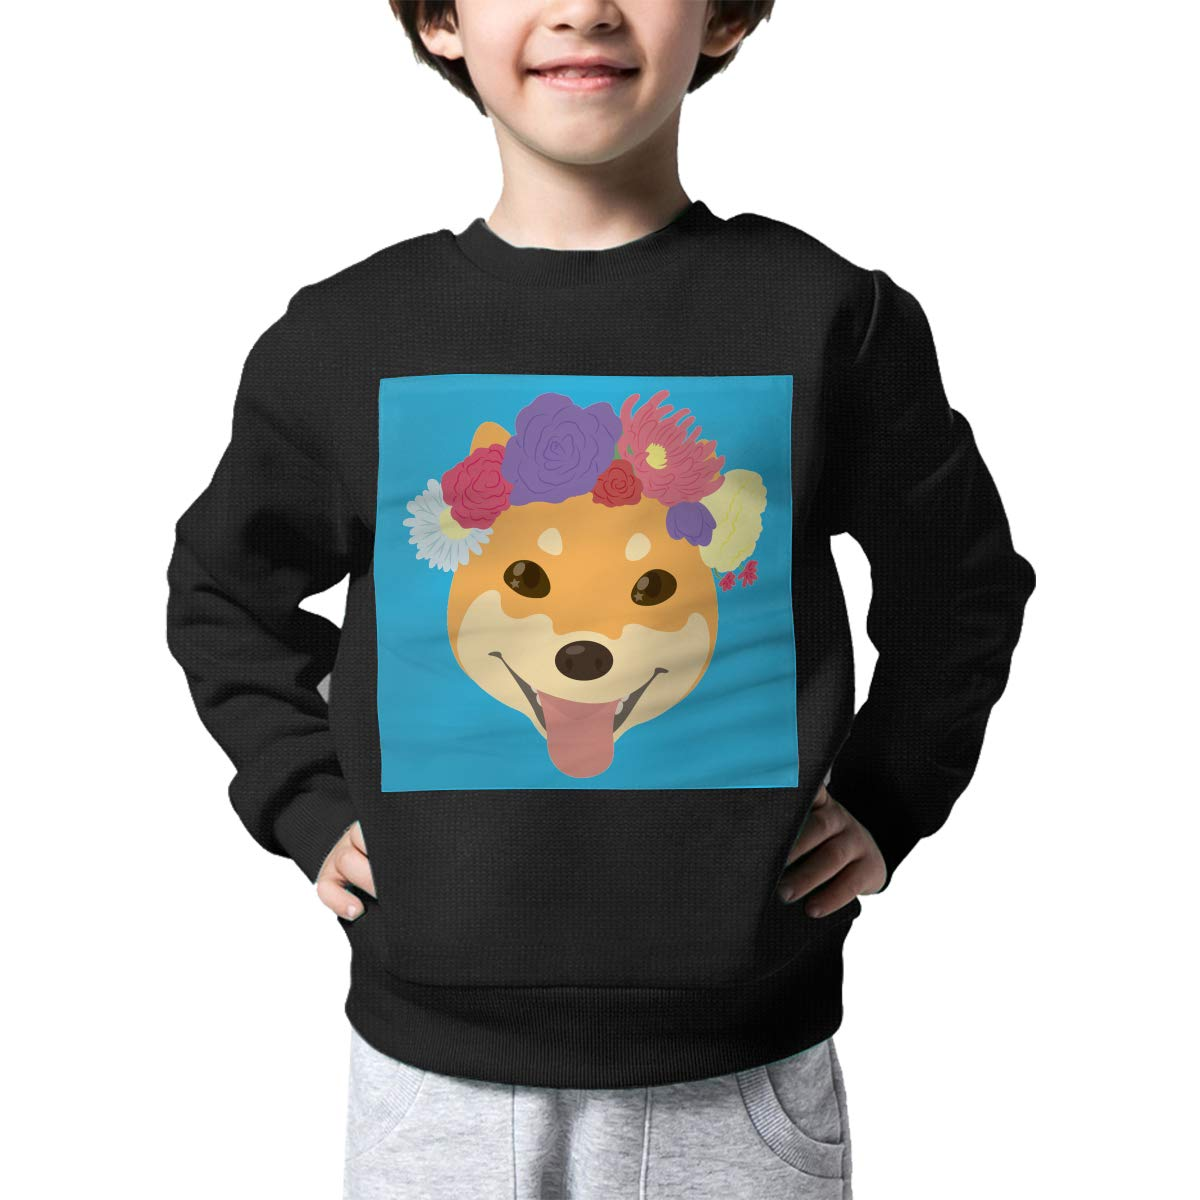 Rainbowhug Shiba Inu Dog Kids Sweater Cool Warm Sweater Toddler for Girls Boys